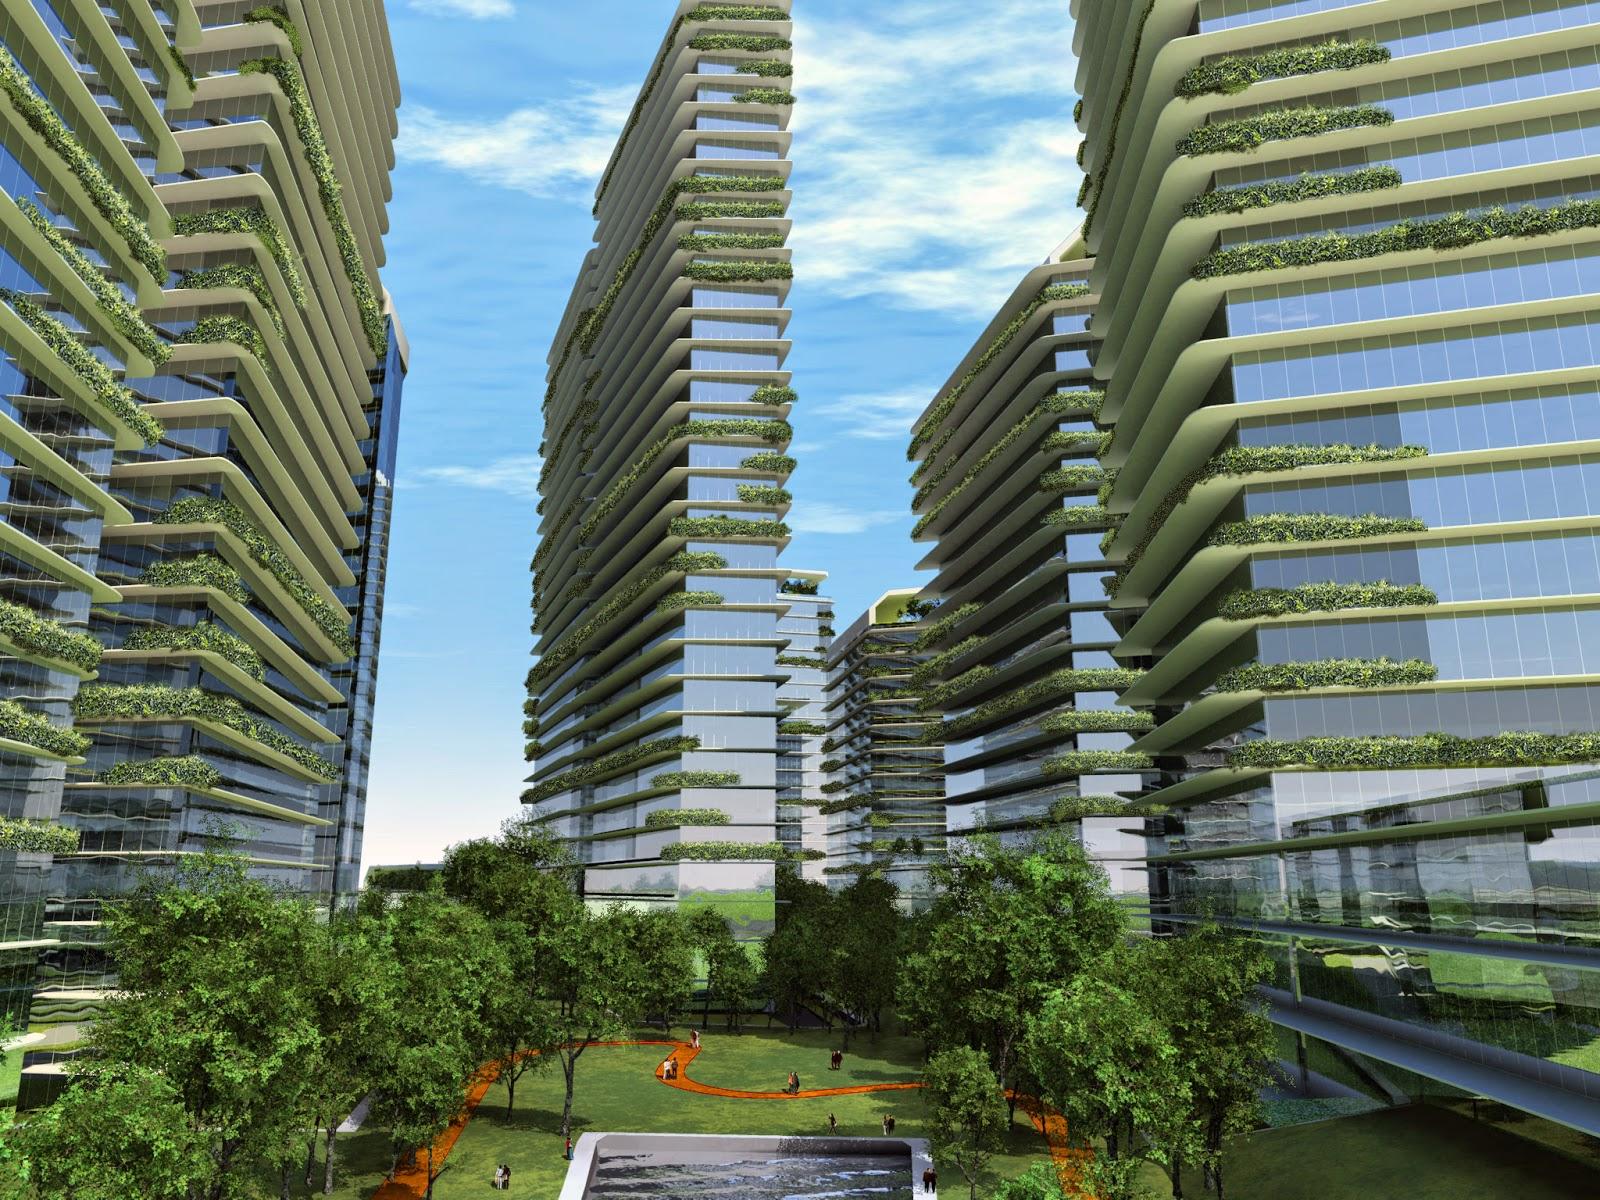 Sustainable building design ecoarchitecture